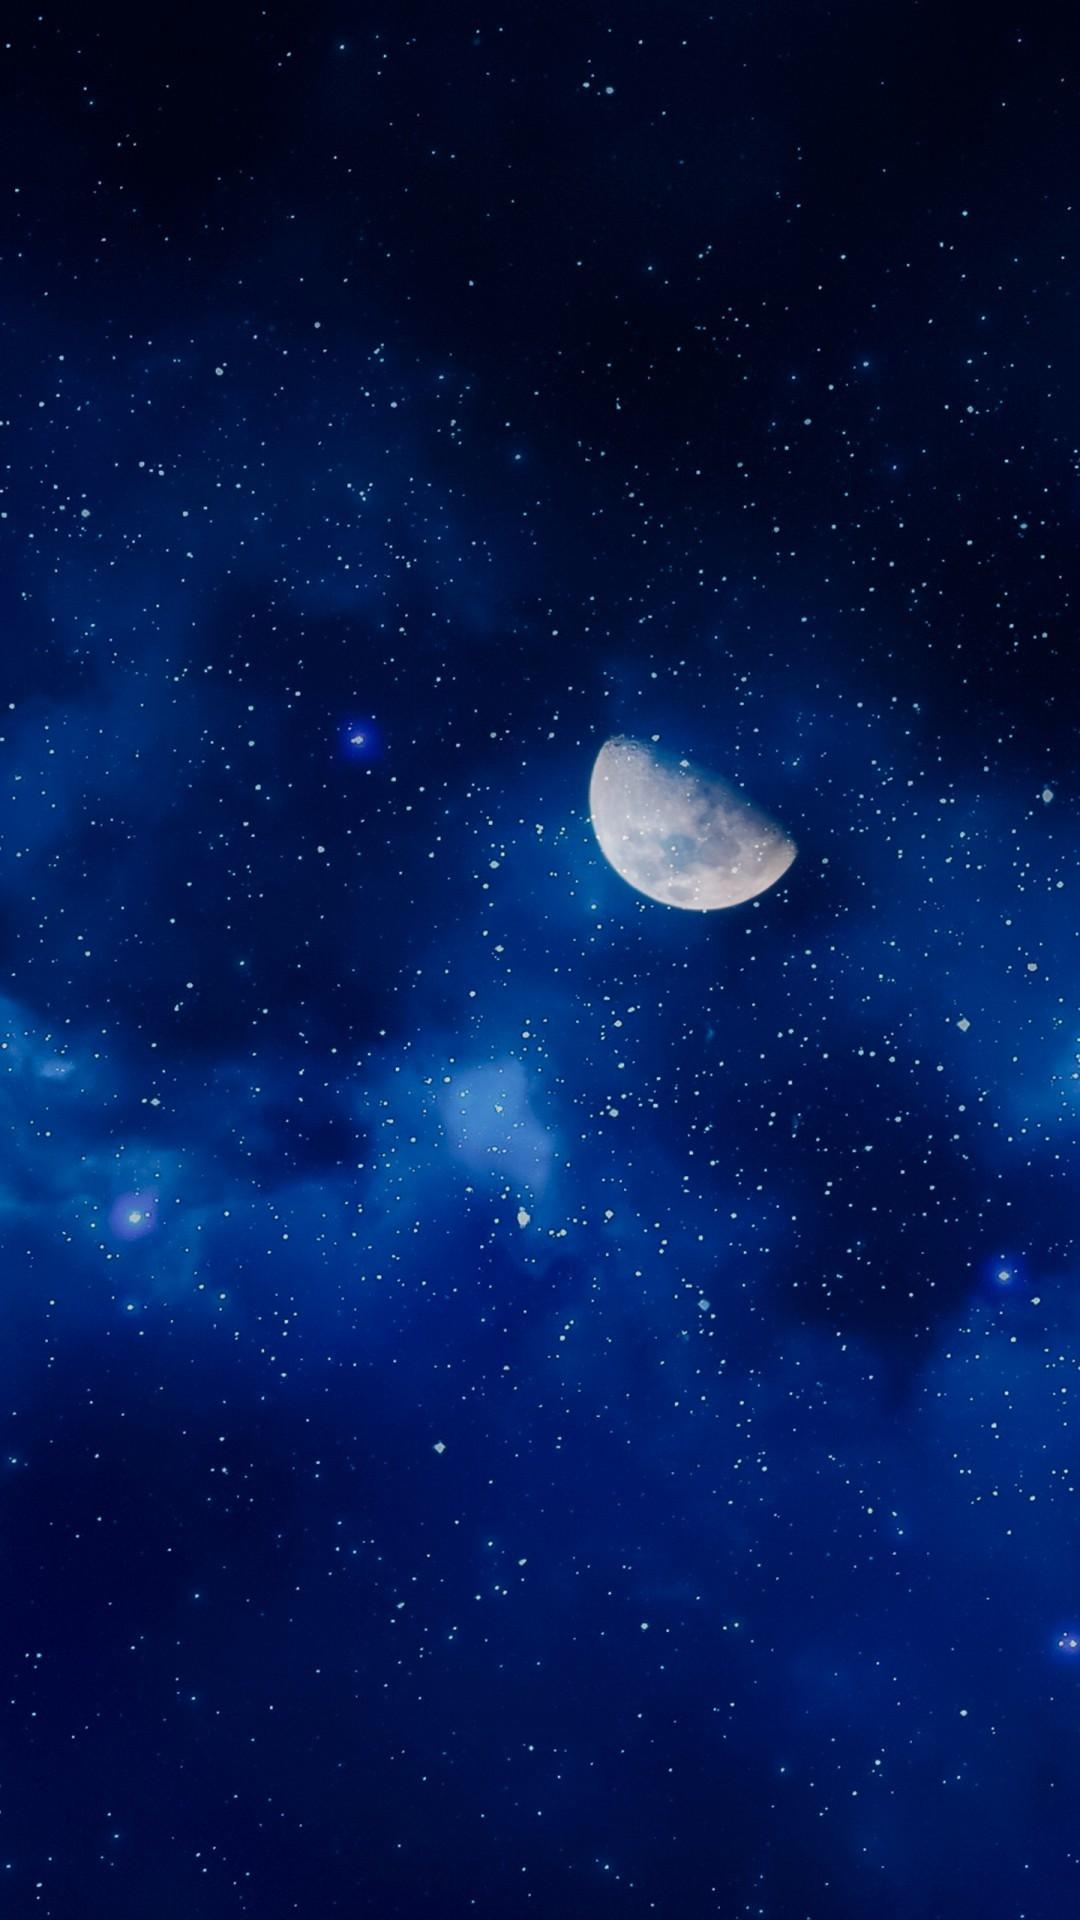 Free Moon Starry Sky phone wallpaper by garth71